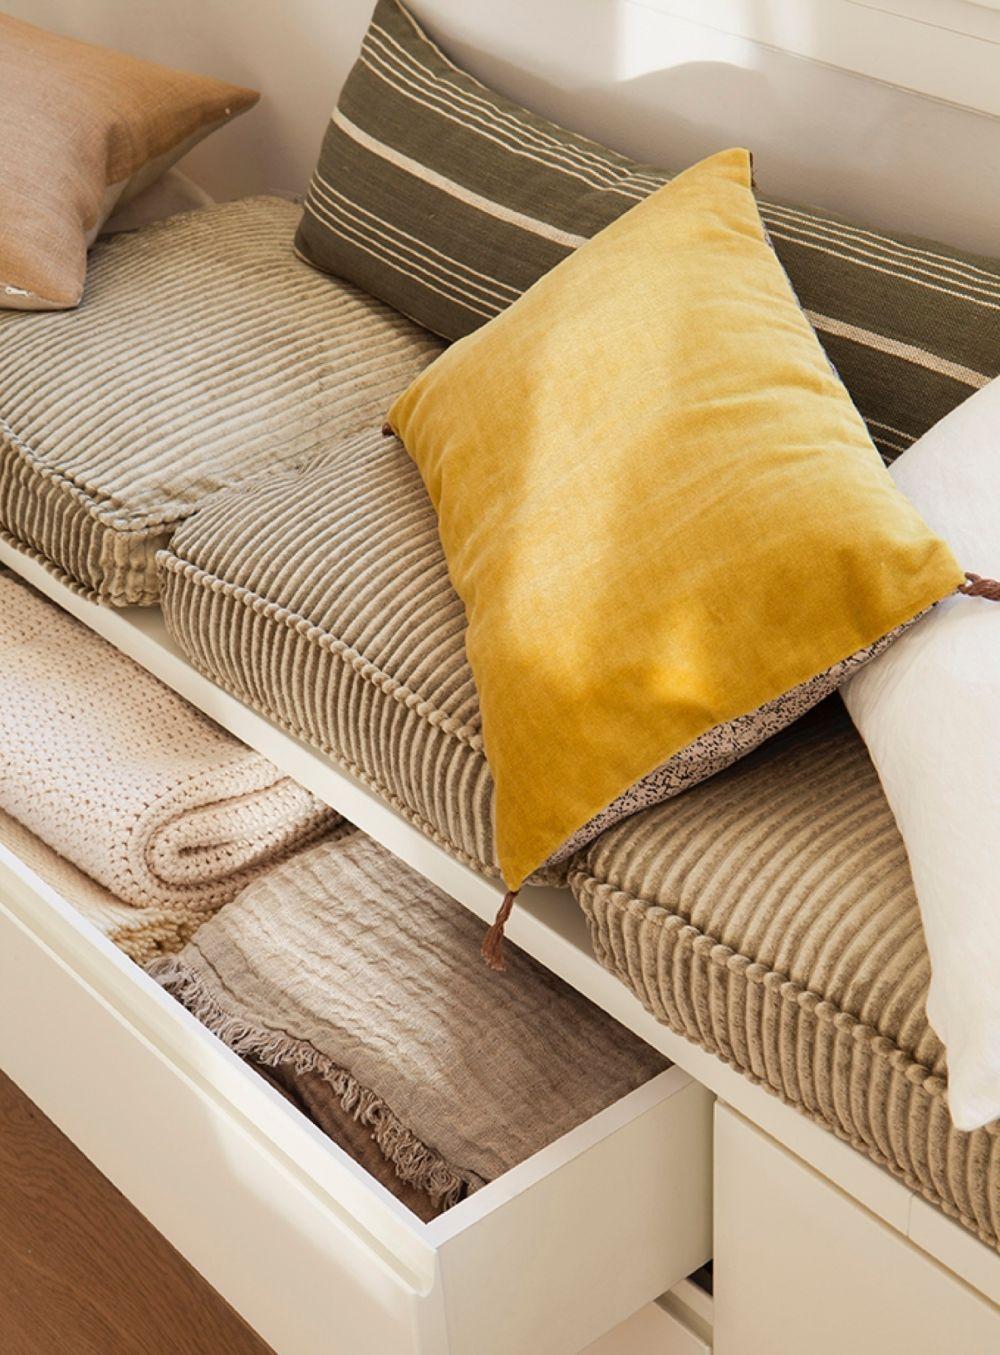 adelaparvu-com-despre-apartament-cald-in-tonuri-neutre-locuinta-spania-design-interior-laura-argelich-si-carla-casanova-foto-jordi-canosa-elmueble-10